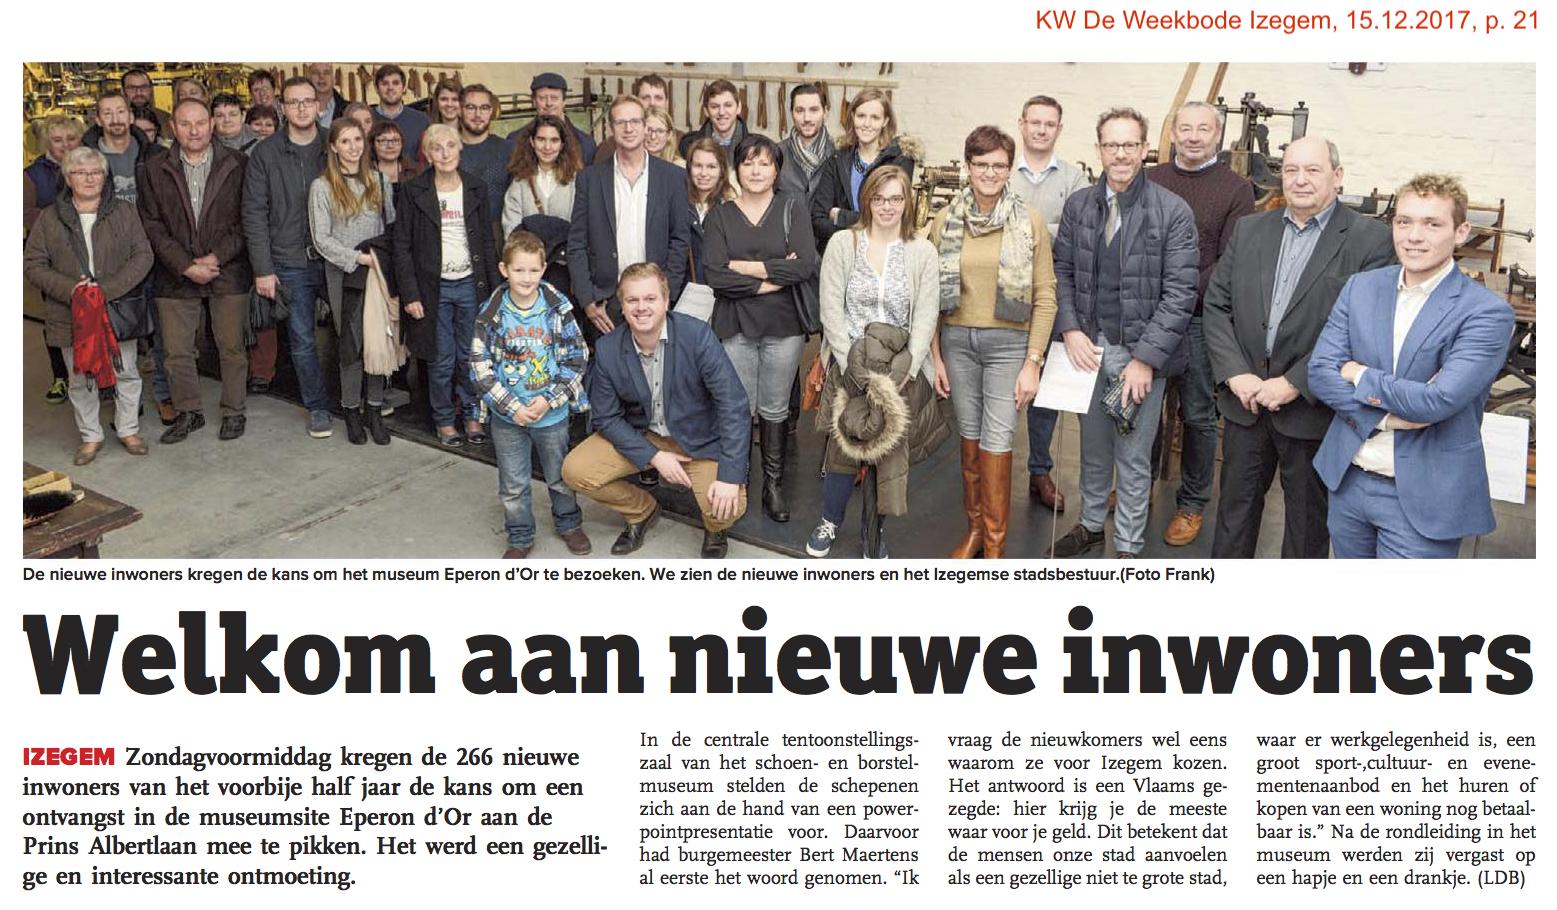 KW De Weekbode Izegem, 15.12.2017, p. 21